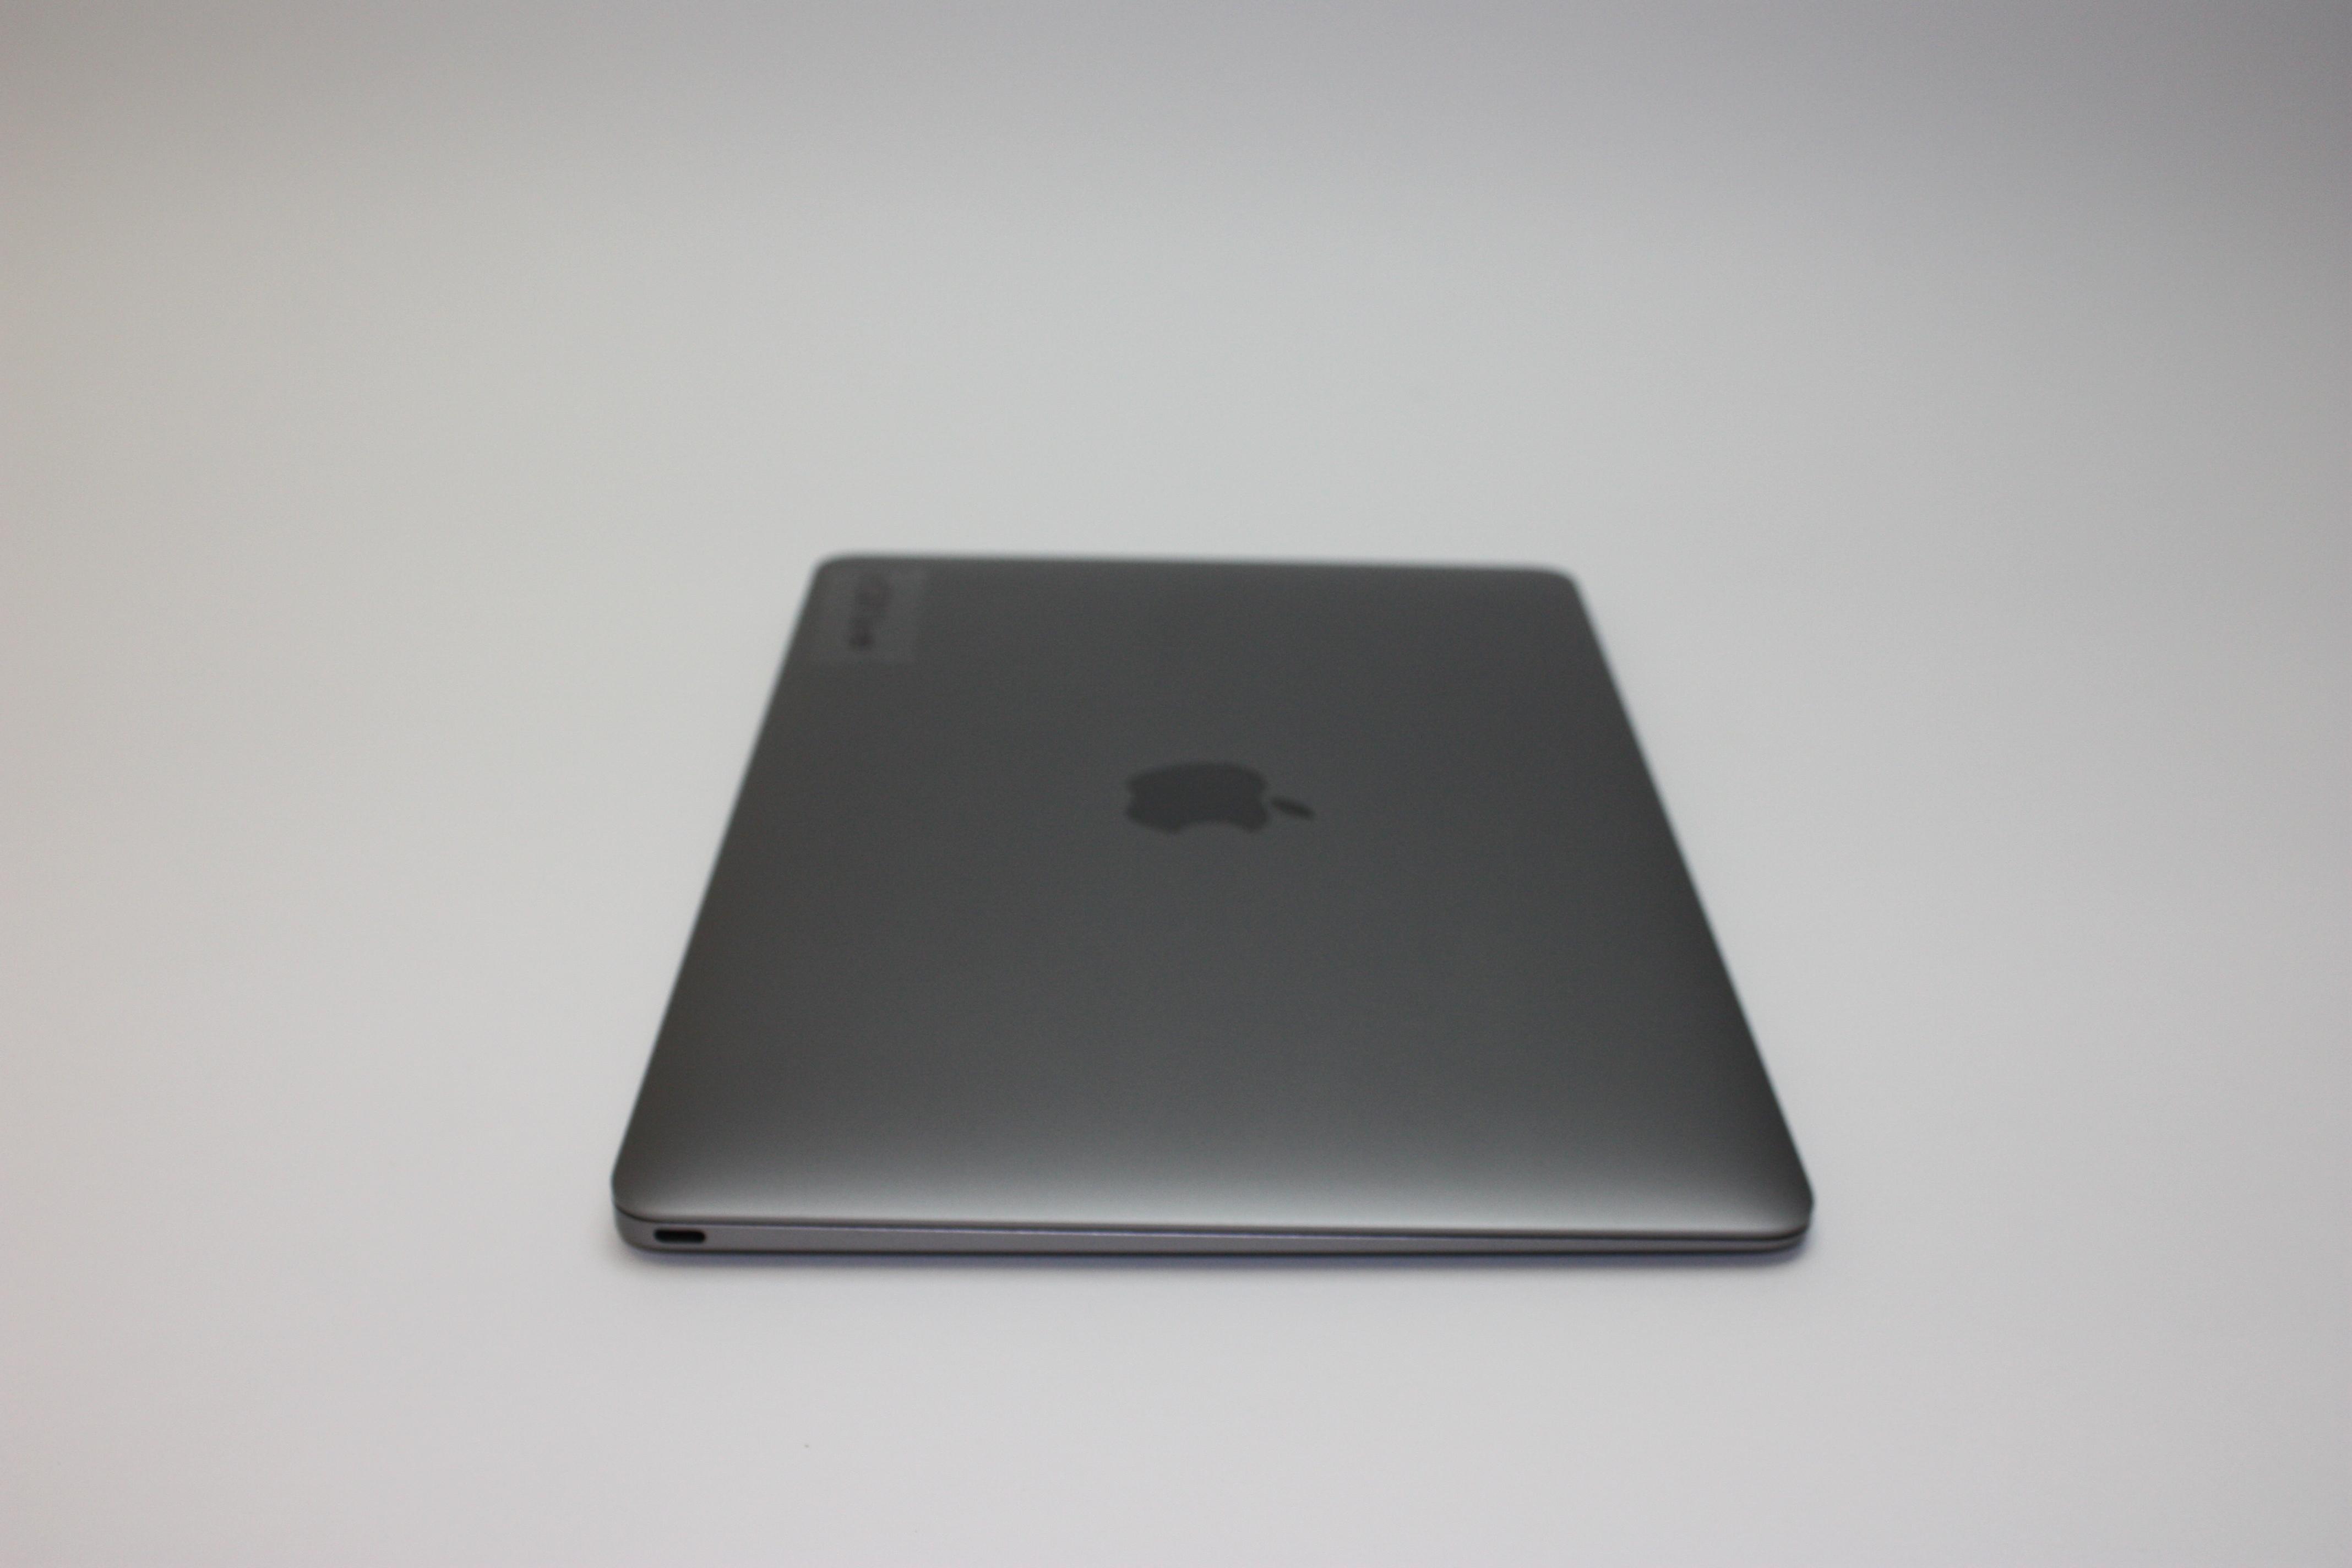 MacBook 12-inch Retina, 1.3 GHz Intel Core M, 8 GB 1600 MHz DDR3, 500 GB Flash Storage, Product age: 29 months, image 5